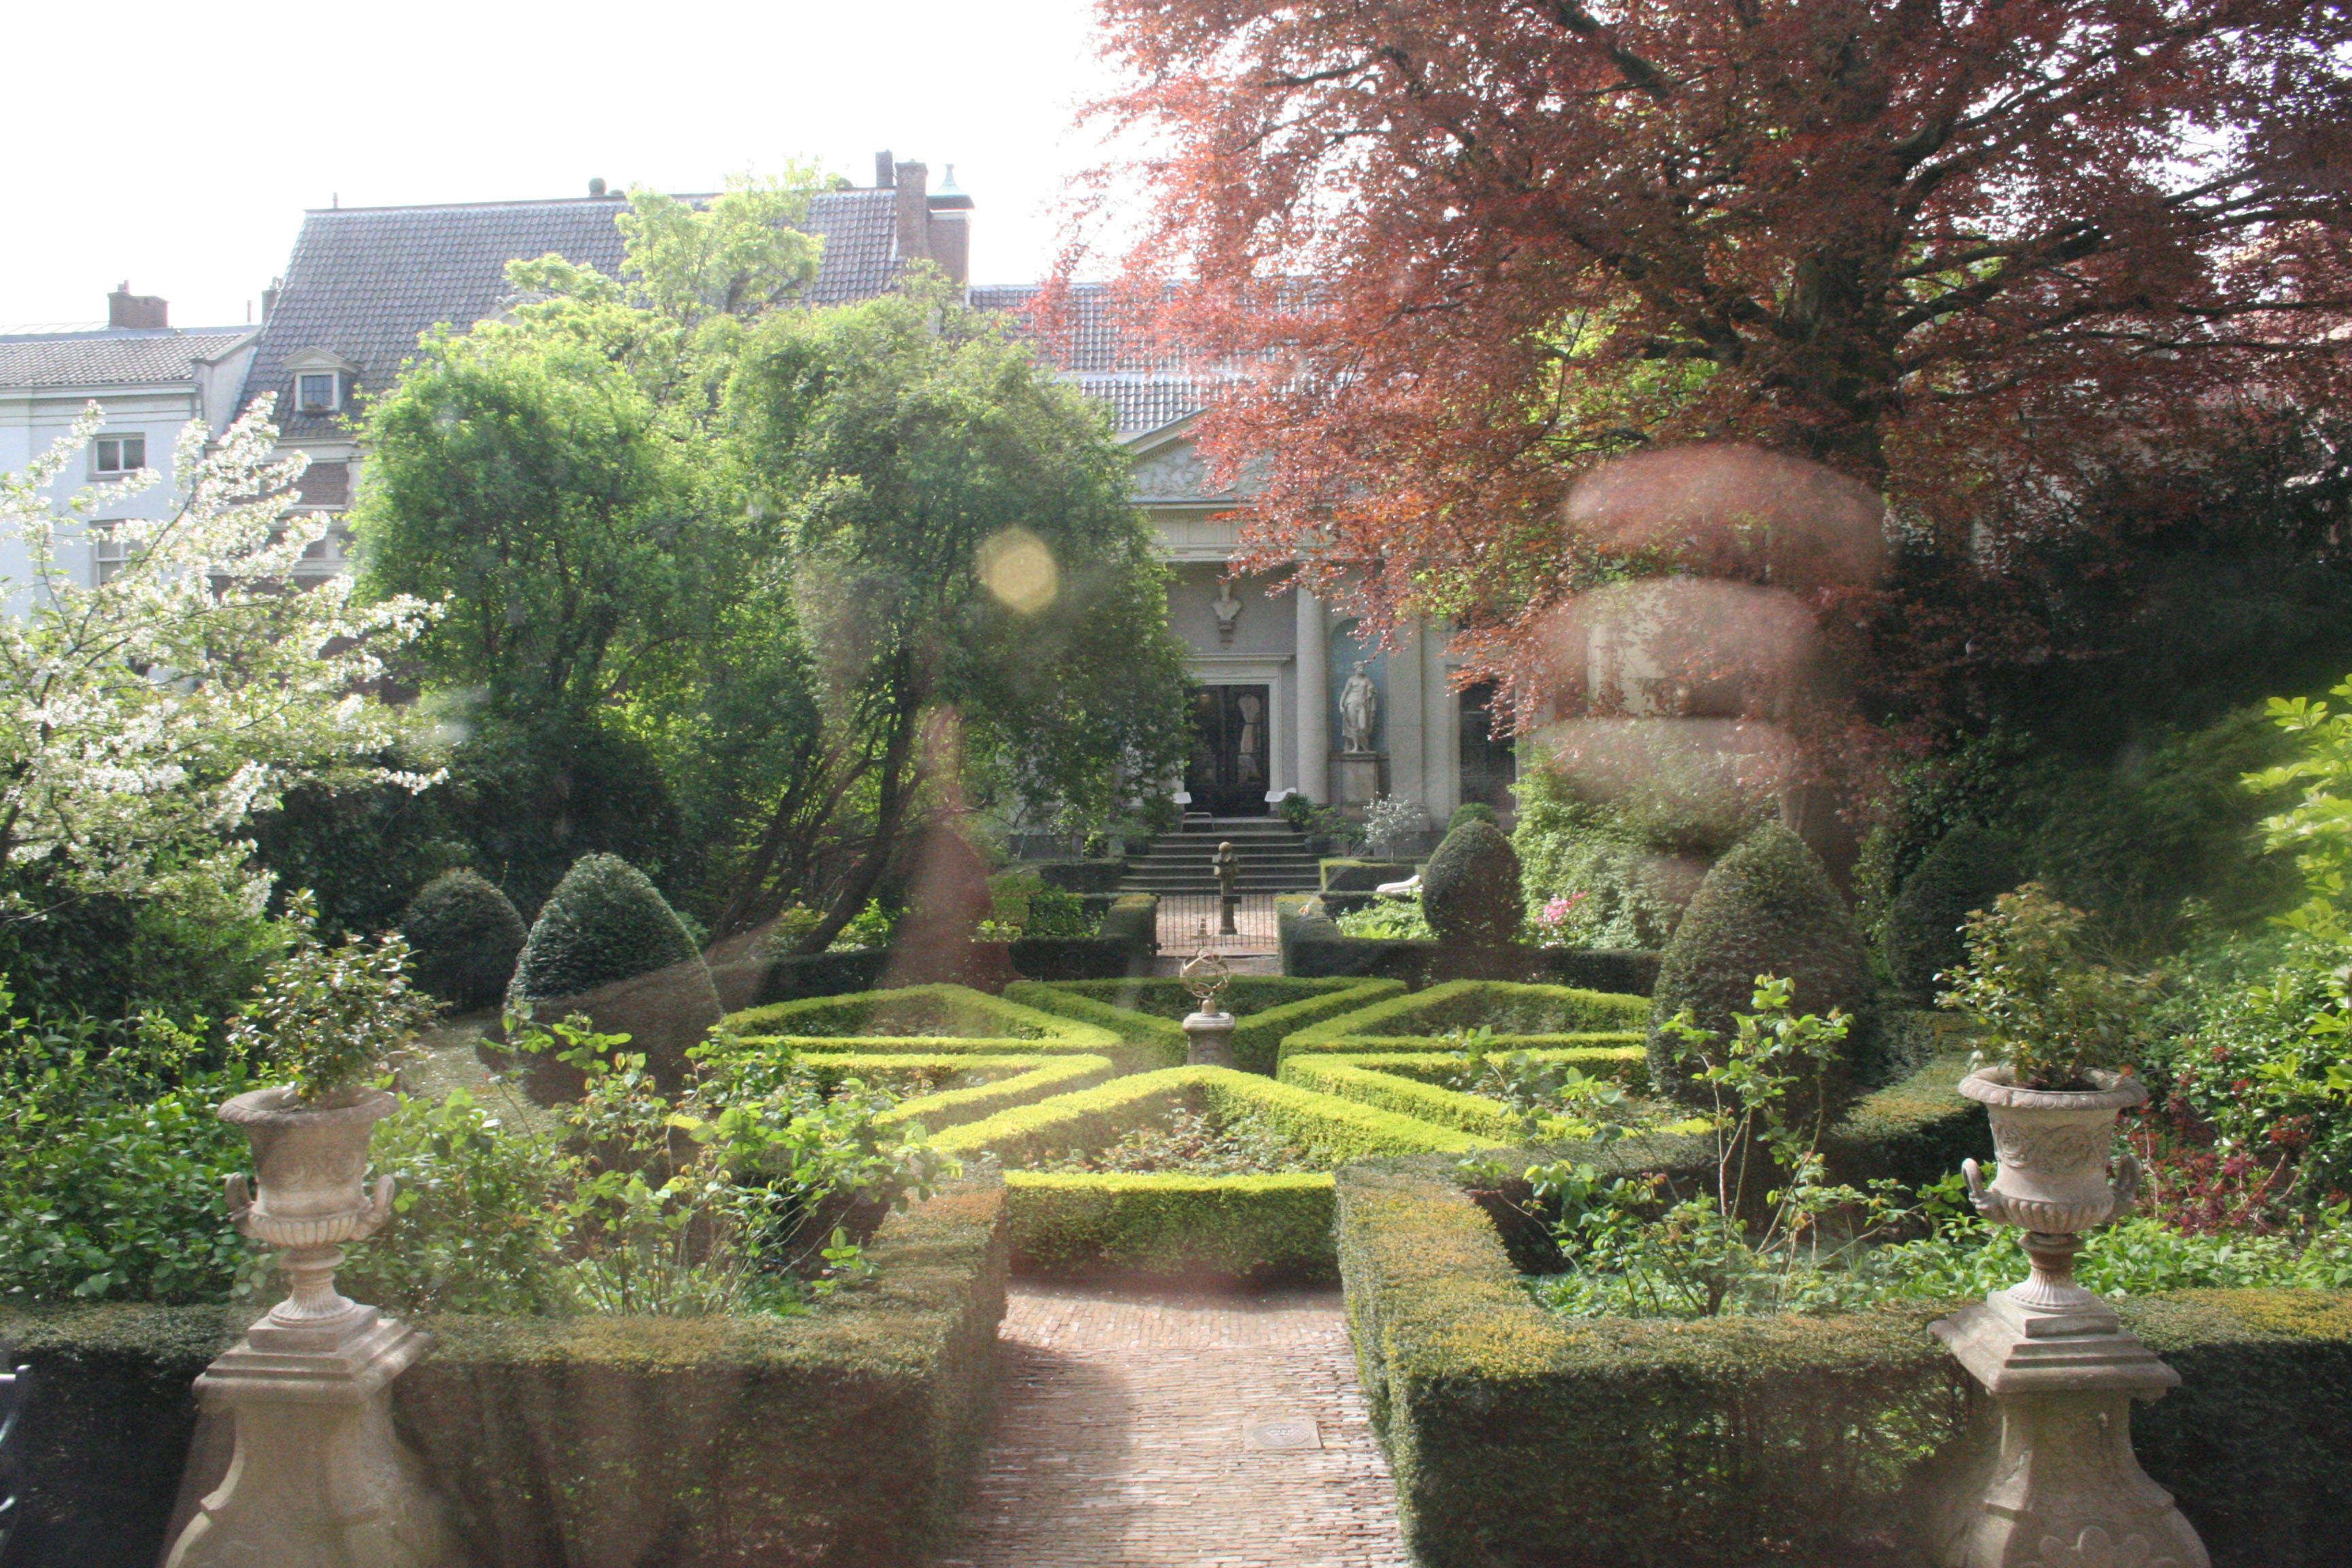 10 garden ideas to steal from amsterdams canal houses gardenista - Amsterdam Garden